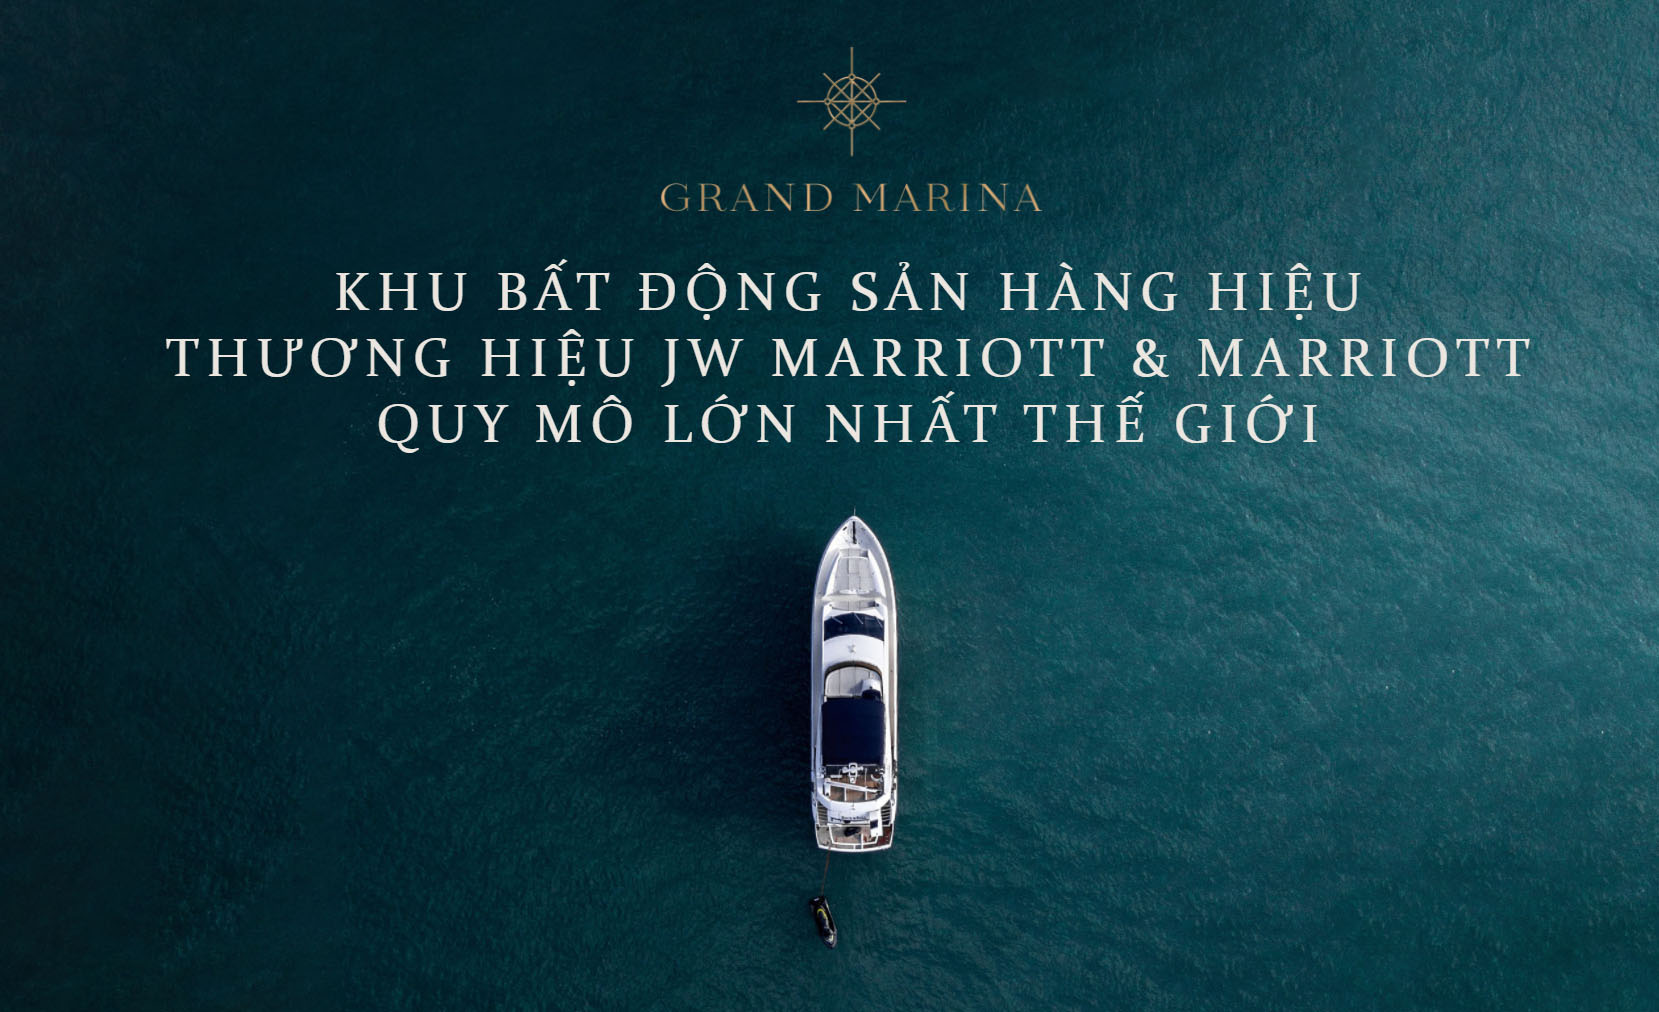 Grand Marina BaSon - Sài Gòn